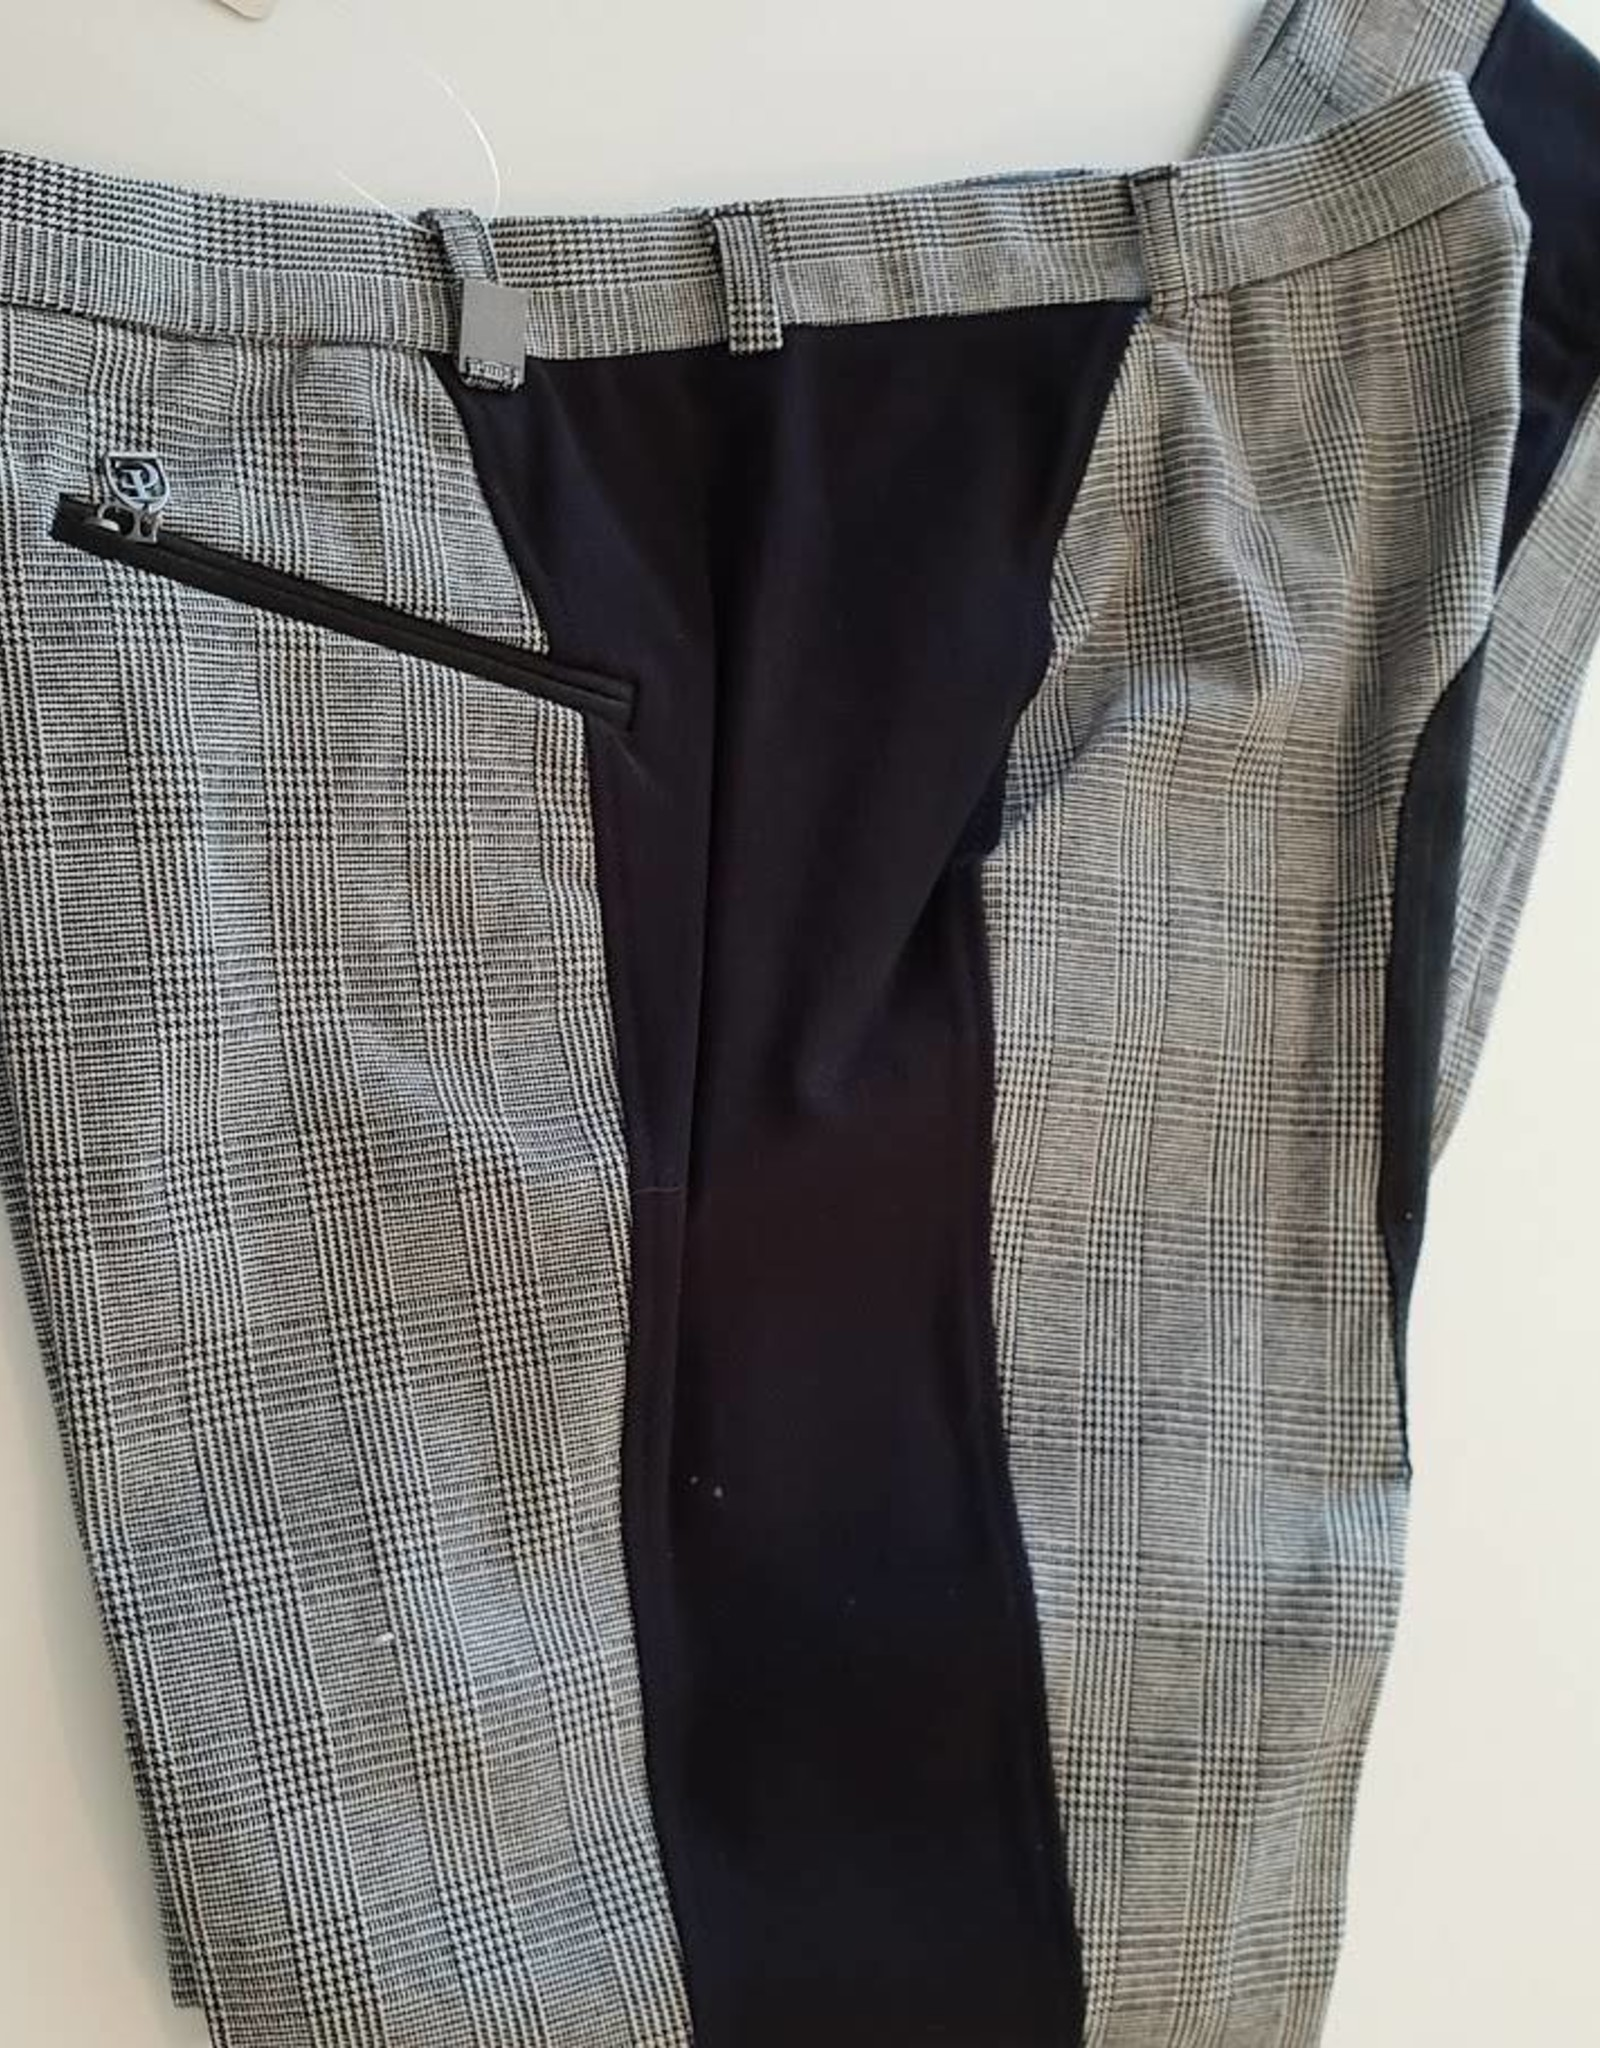 Thomas Cook Thomas Cook Side Splice Jodhpur - Black/Grey - Size 14